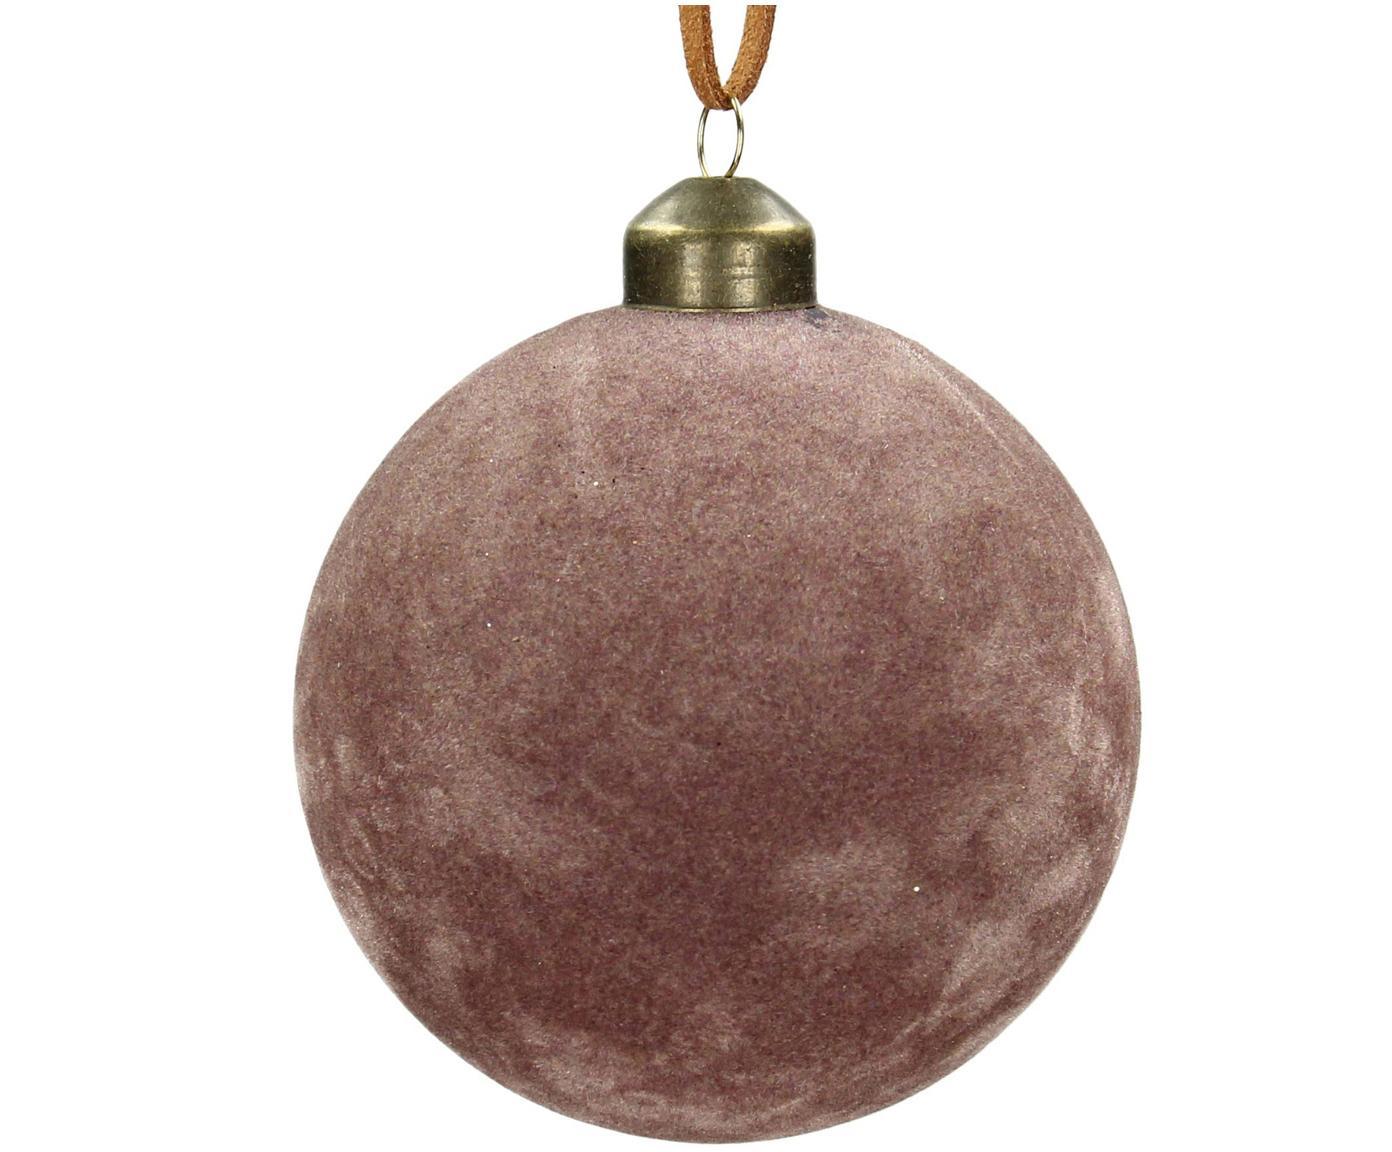 Weihnachtskugeln Velvet Ø8cm, 4Stück, Glas, Polyestersamt, Rosa, Ø 8 cm